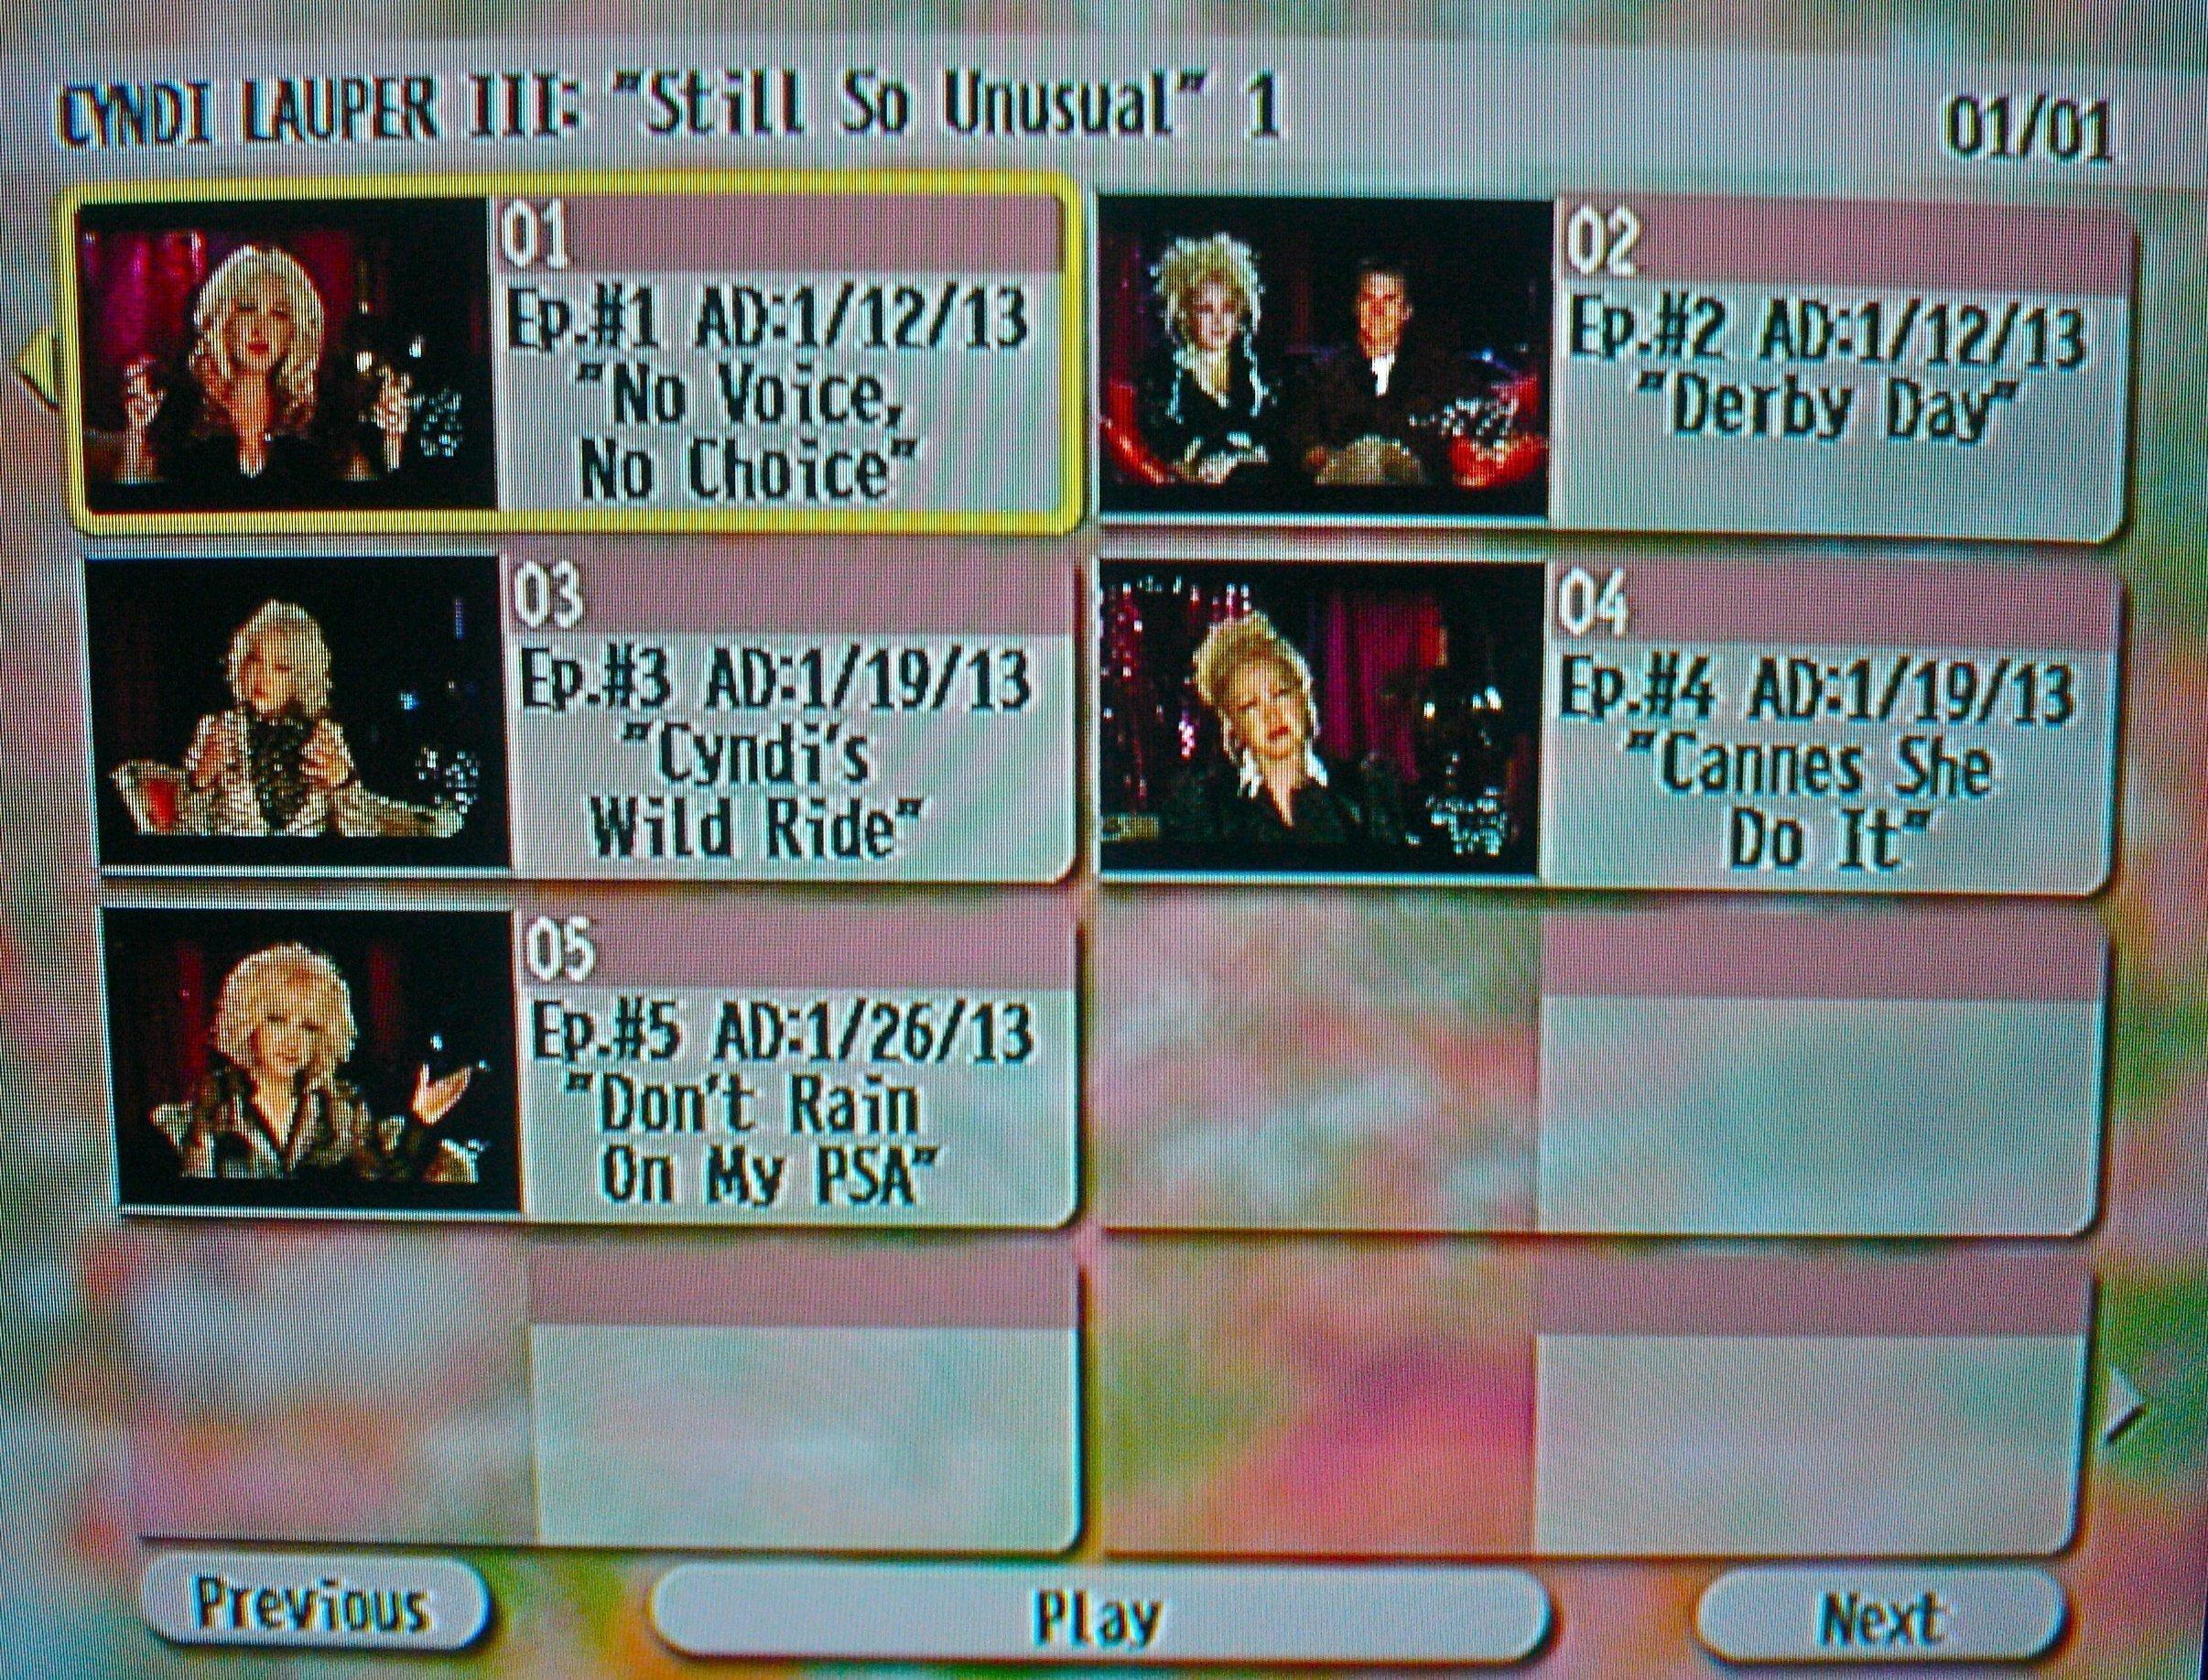 "Cyndi Lauper The Video Archives 2013 Volume III (""Still So Unusual"" Season 1 Disc 1 of 3)"